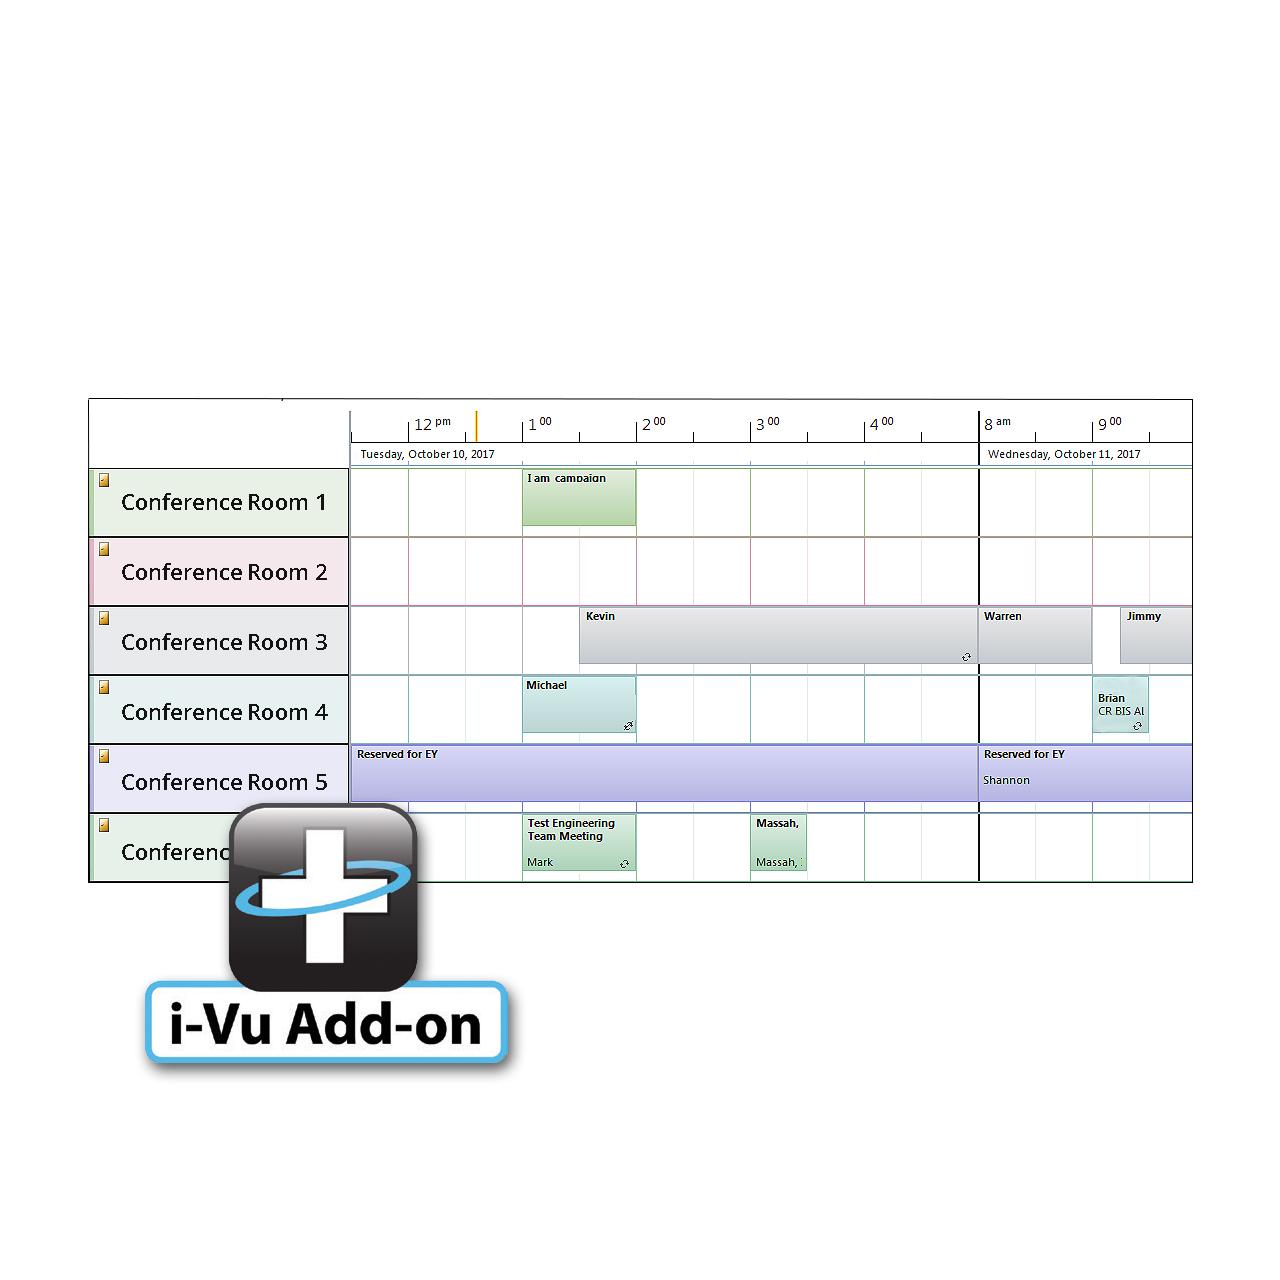 carrier-ADD-SCH-EXCH-microsoft-exchange-scheduling-add-on-for-ivu